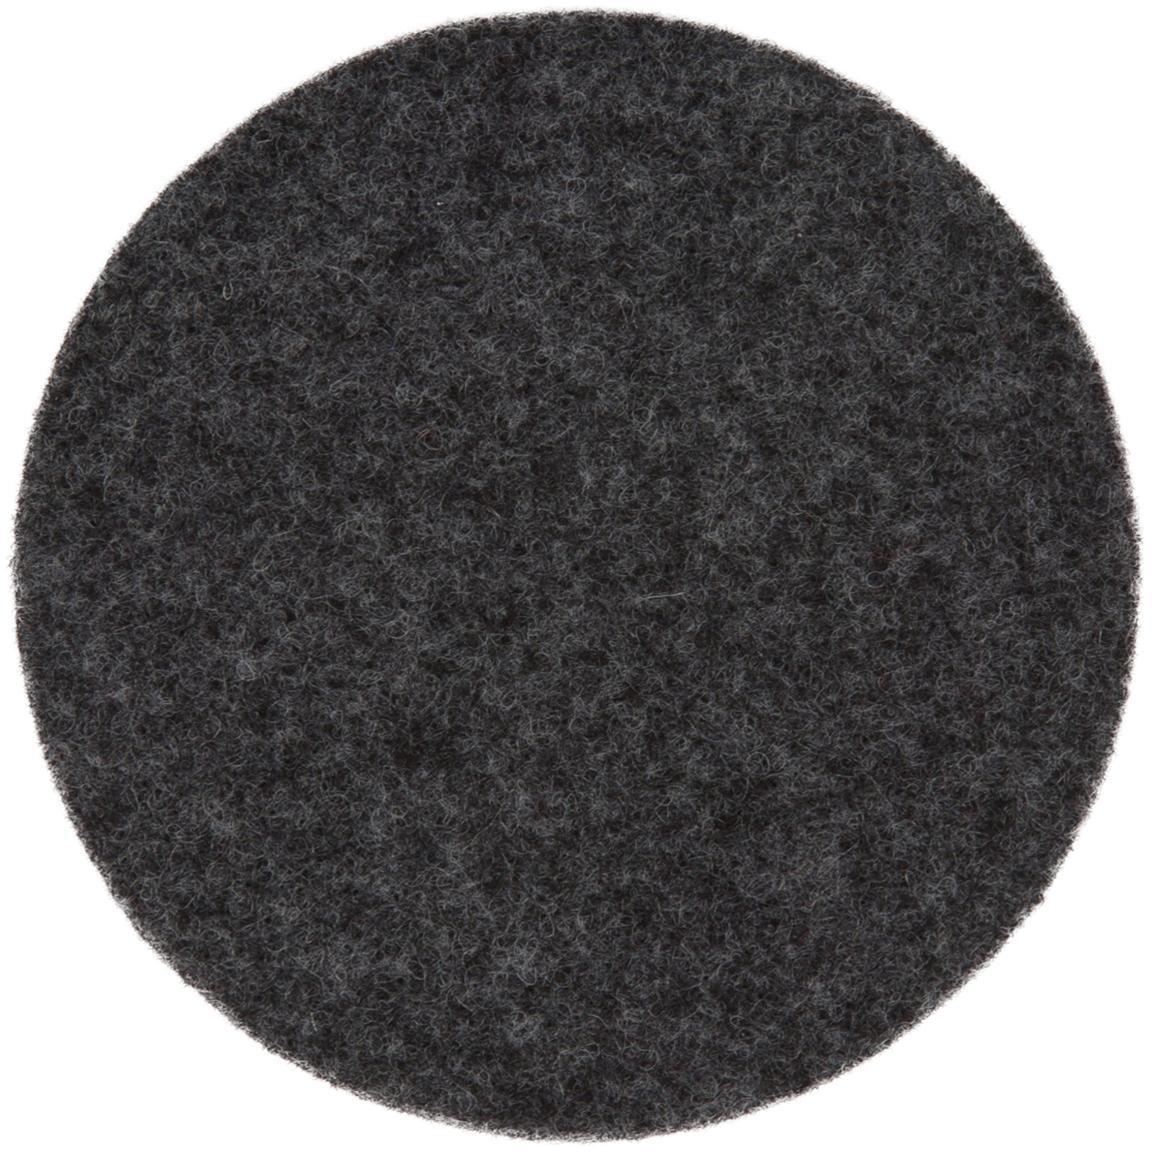 Posavasos de fieltro Leandra, 6uds., 90% lana, 10% polietileno, Gris antracita, Ø 10 cm